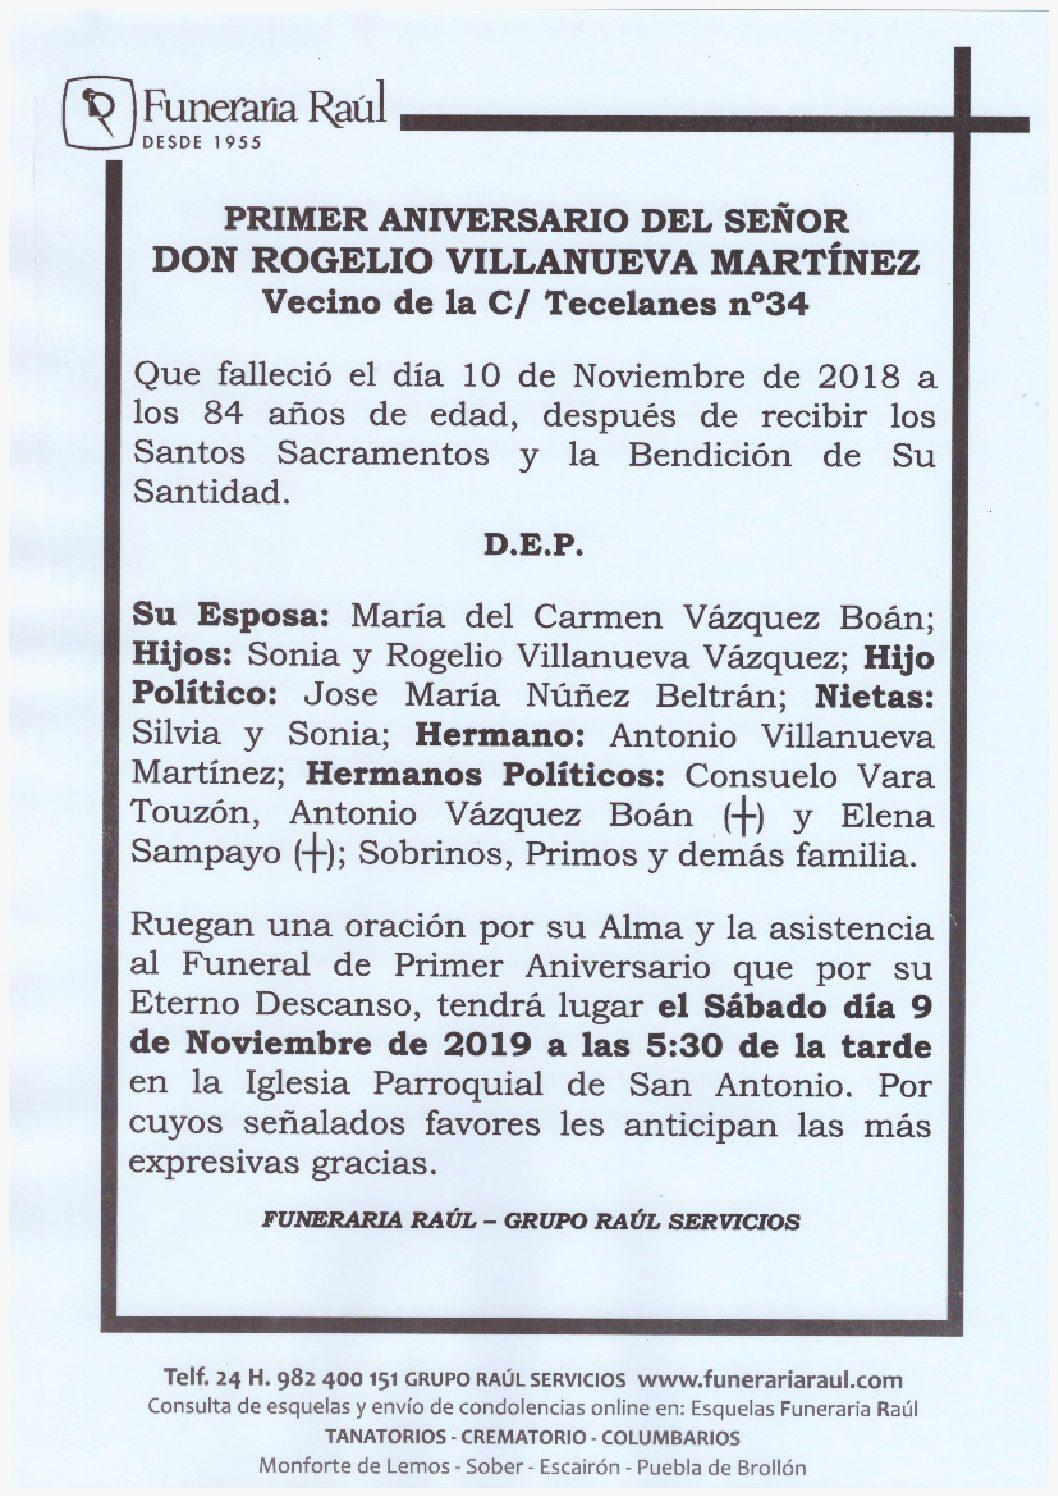 PRIMER ANIVERSARIO DE DON ROGELIO VILLANUEVA MARTINEZ